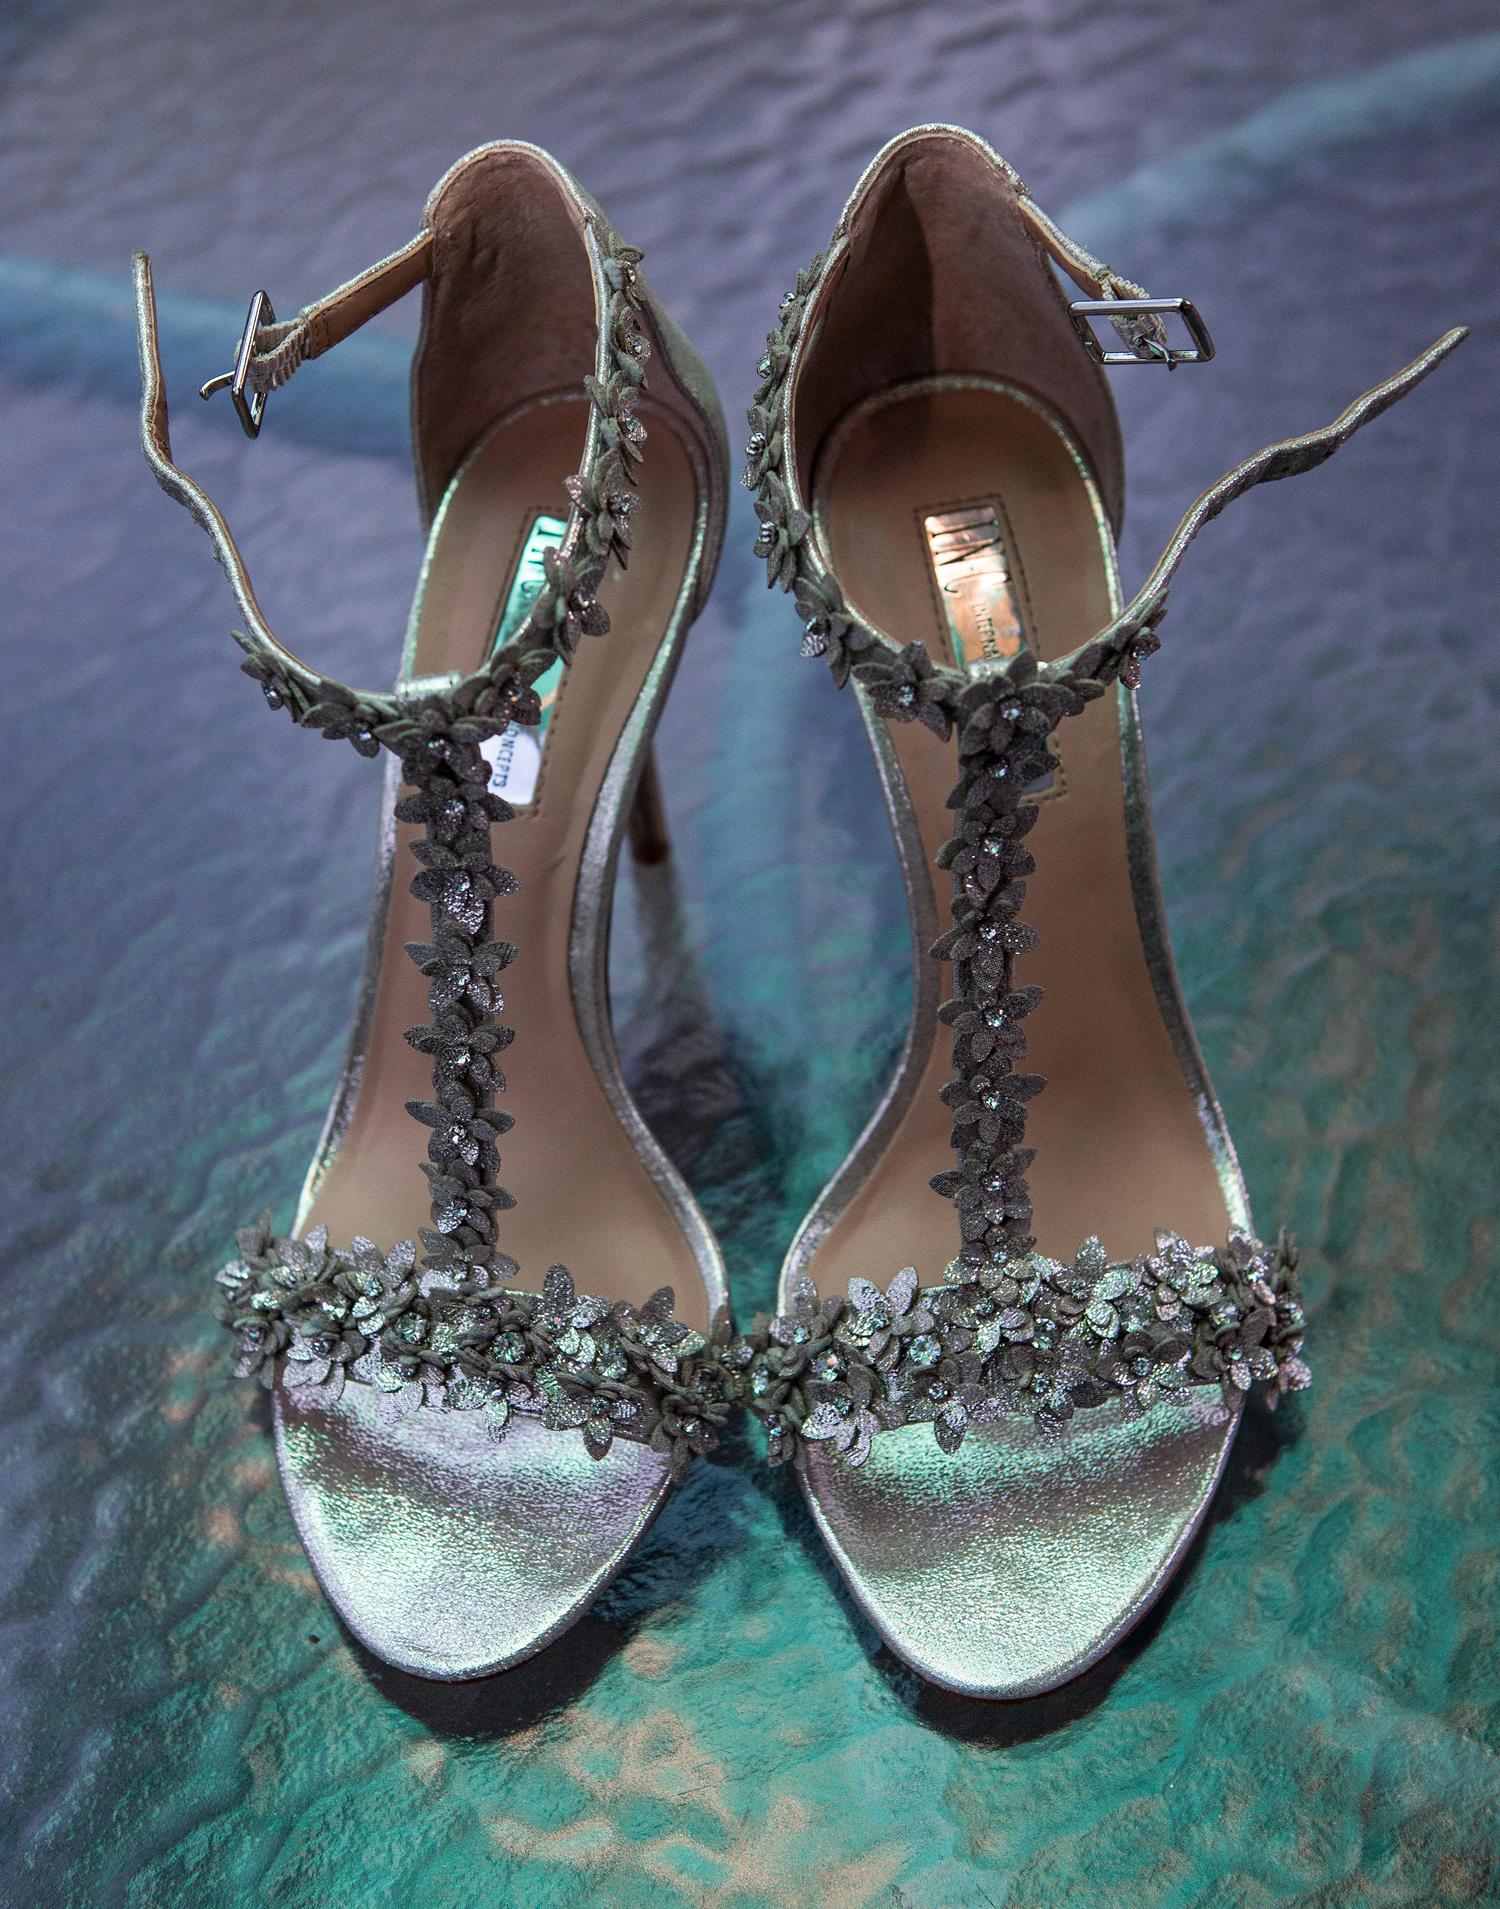 Shoes_6328.jpg